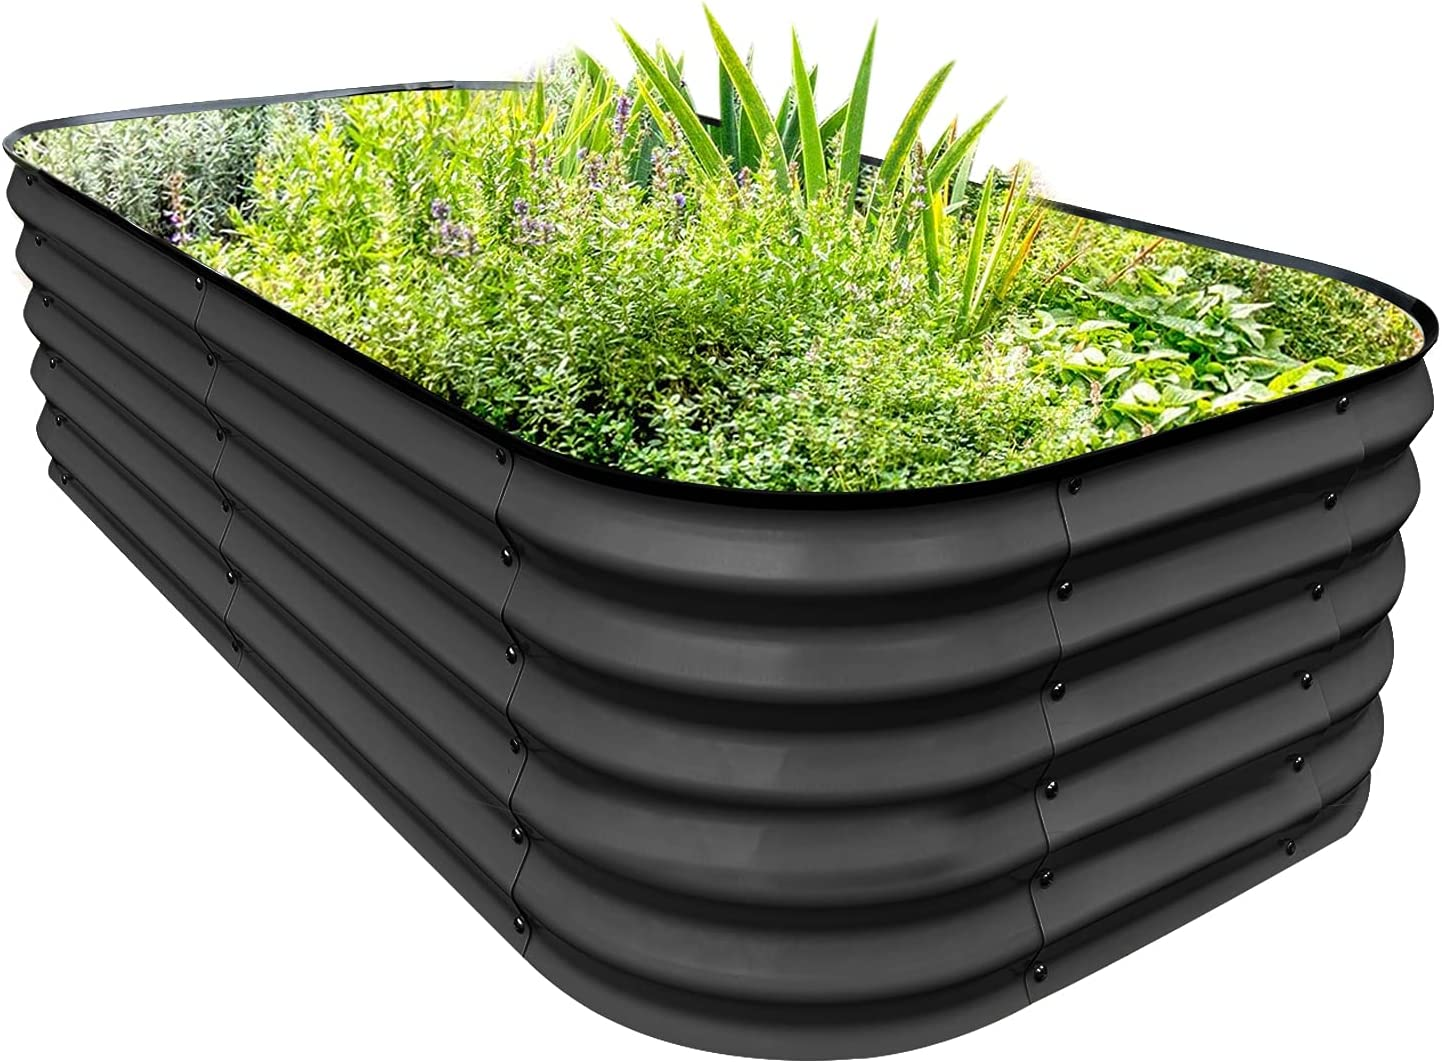 PINTIA1 Steel Raised Garden Beds for Vegetables Flowers, Large Outdoor Planter Herbs Garden Bed Galvanised Steel (6X3X1.45 FT, Charcoal Grey)